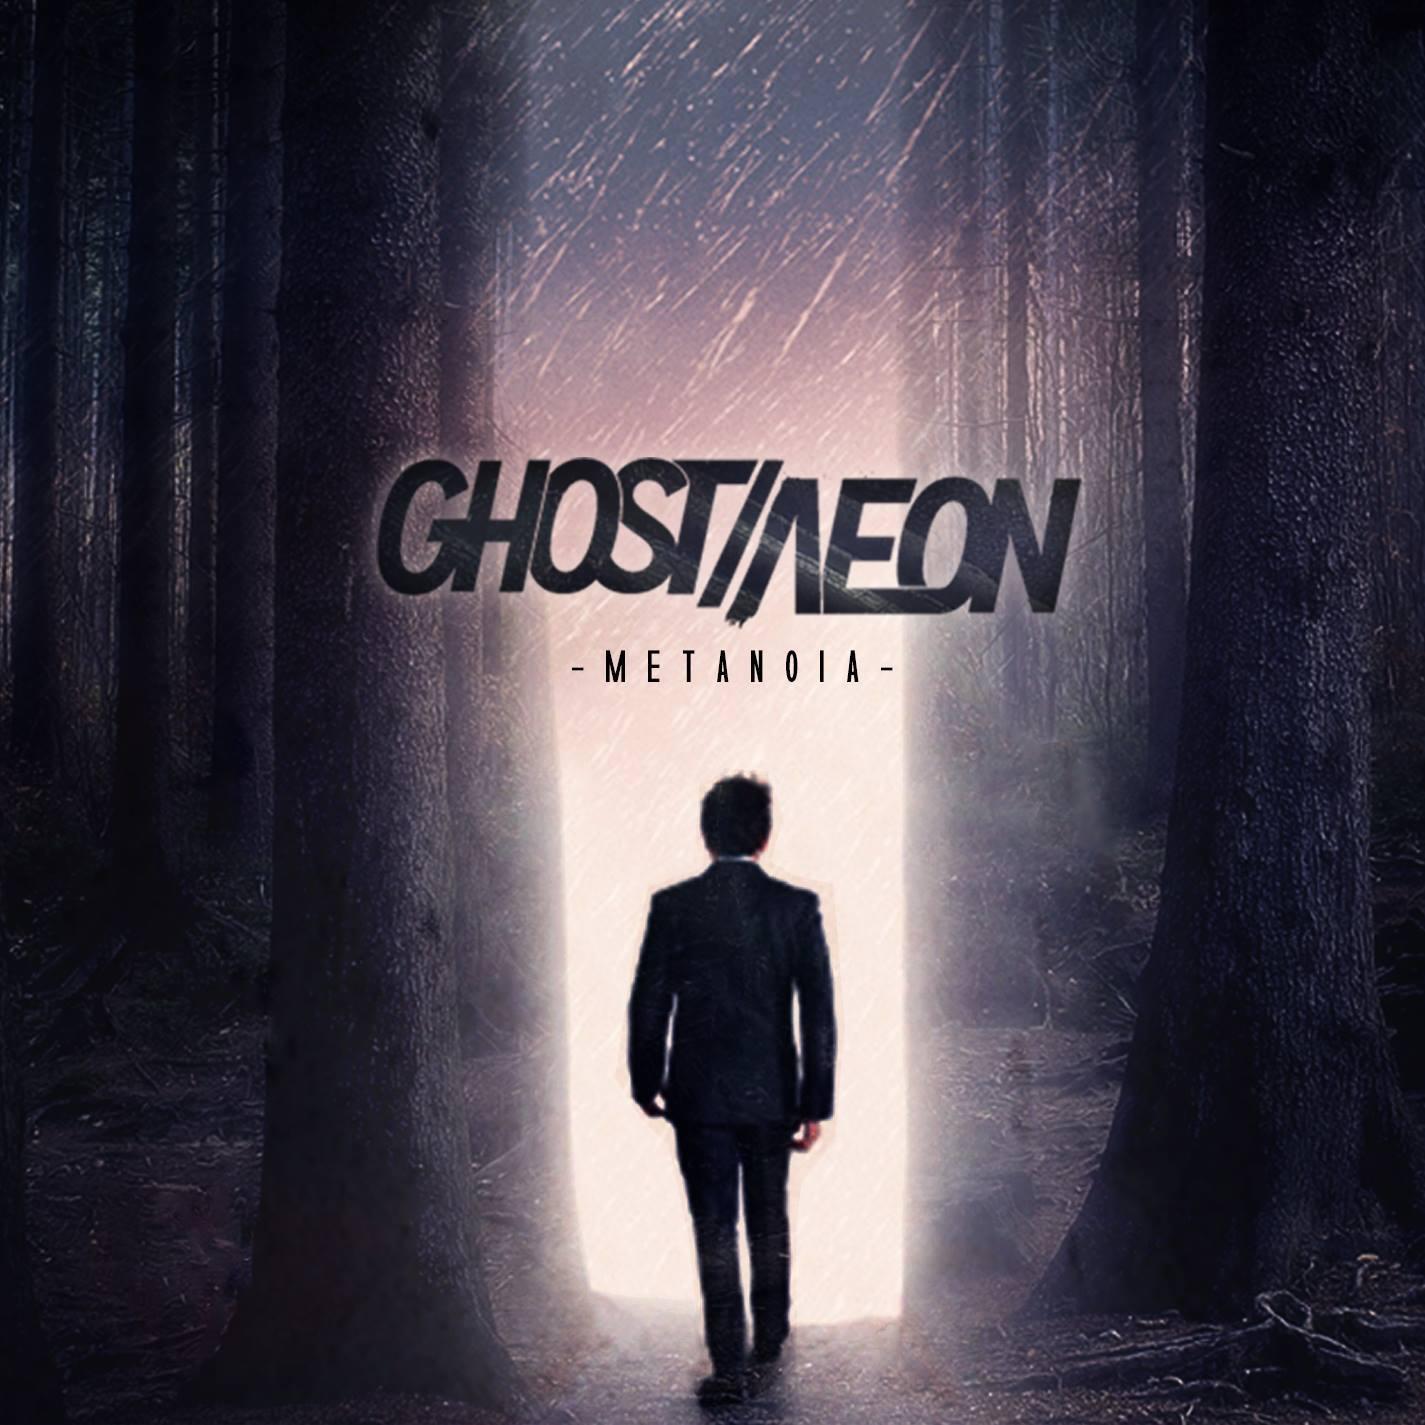 Ghost/Aeon - Metanoia (2016)